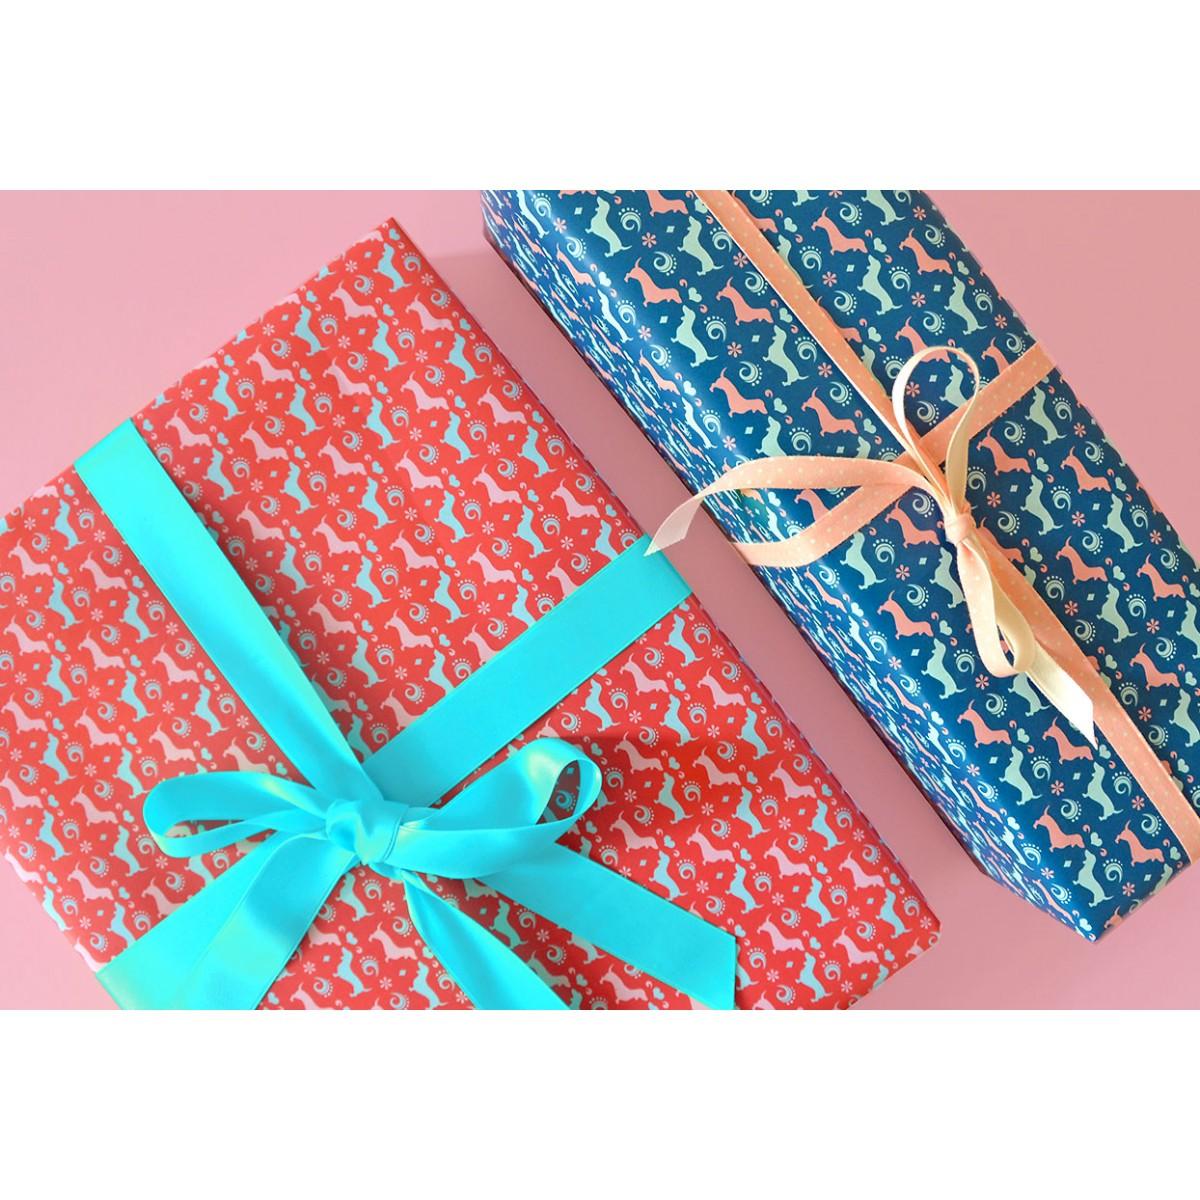 Geschenkpapier WALDI dunkelblau // 3 Bögen